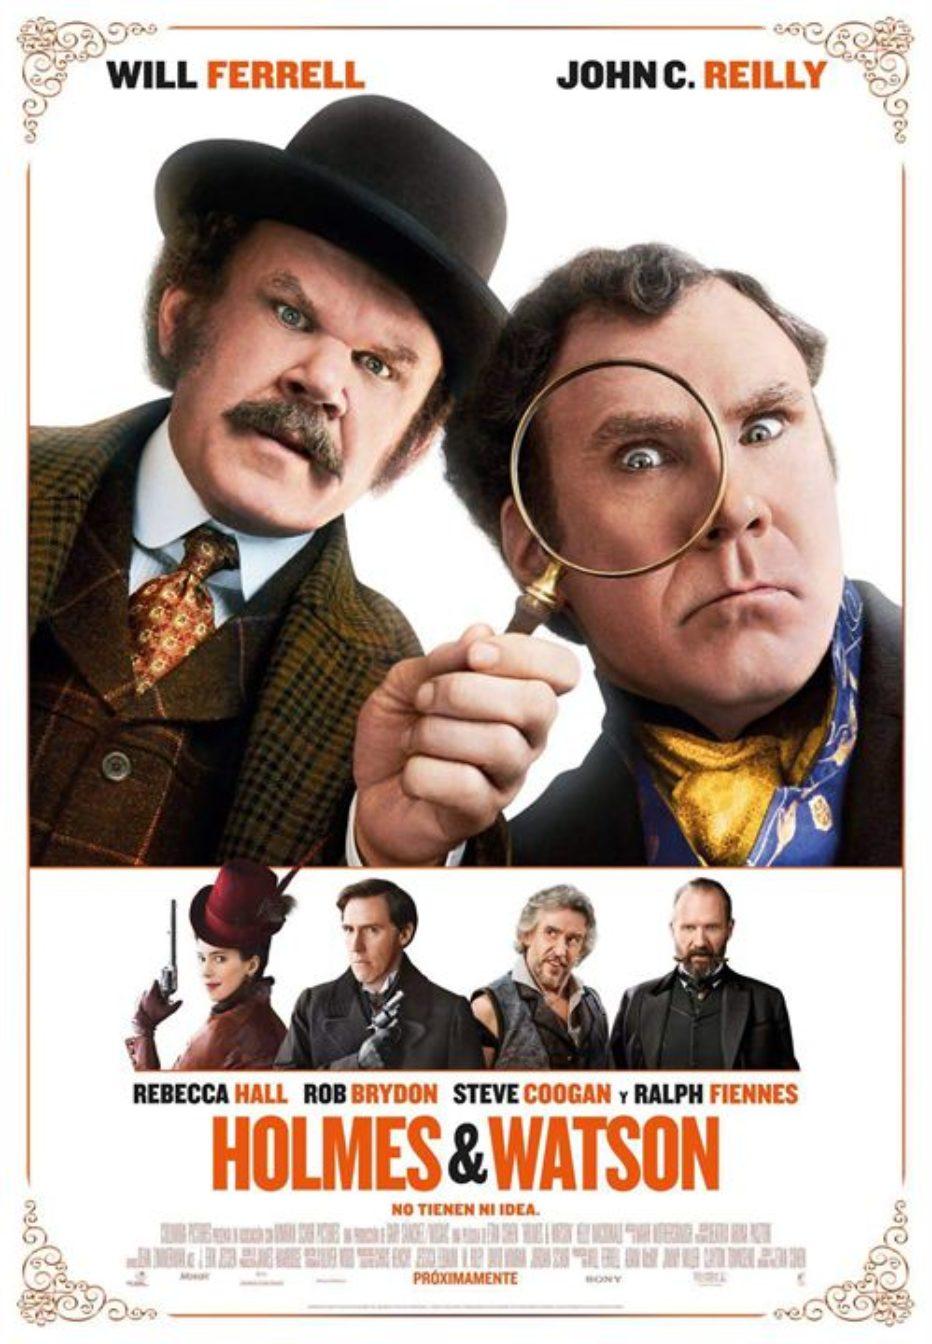 Holmes & Watson: parodia de vergüenza ajena